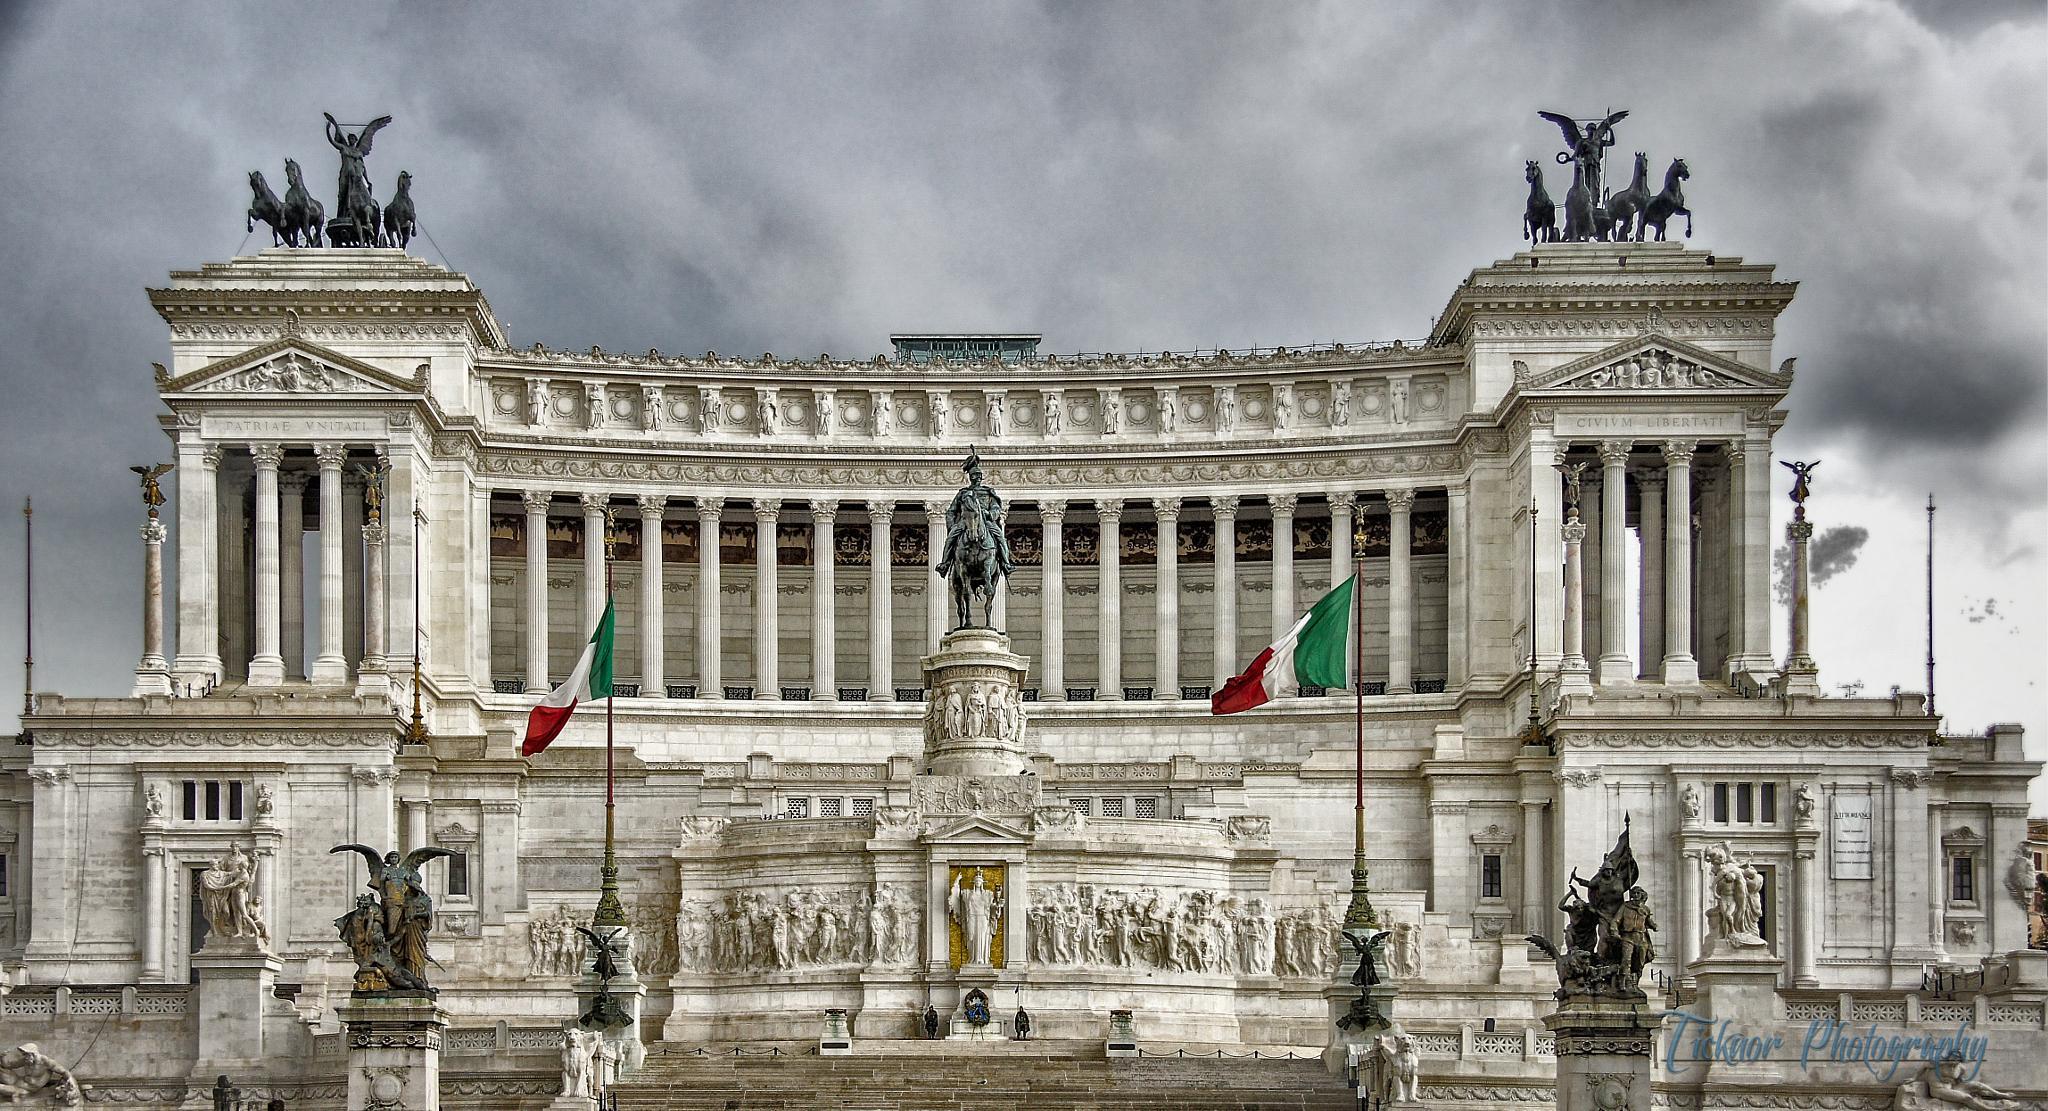 Wedding Cake - Monumento Nazionale a Vittorio Emanuele II by TicknorPhoto